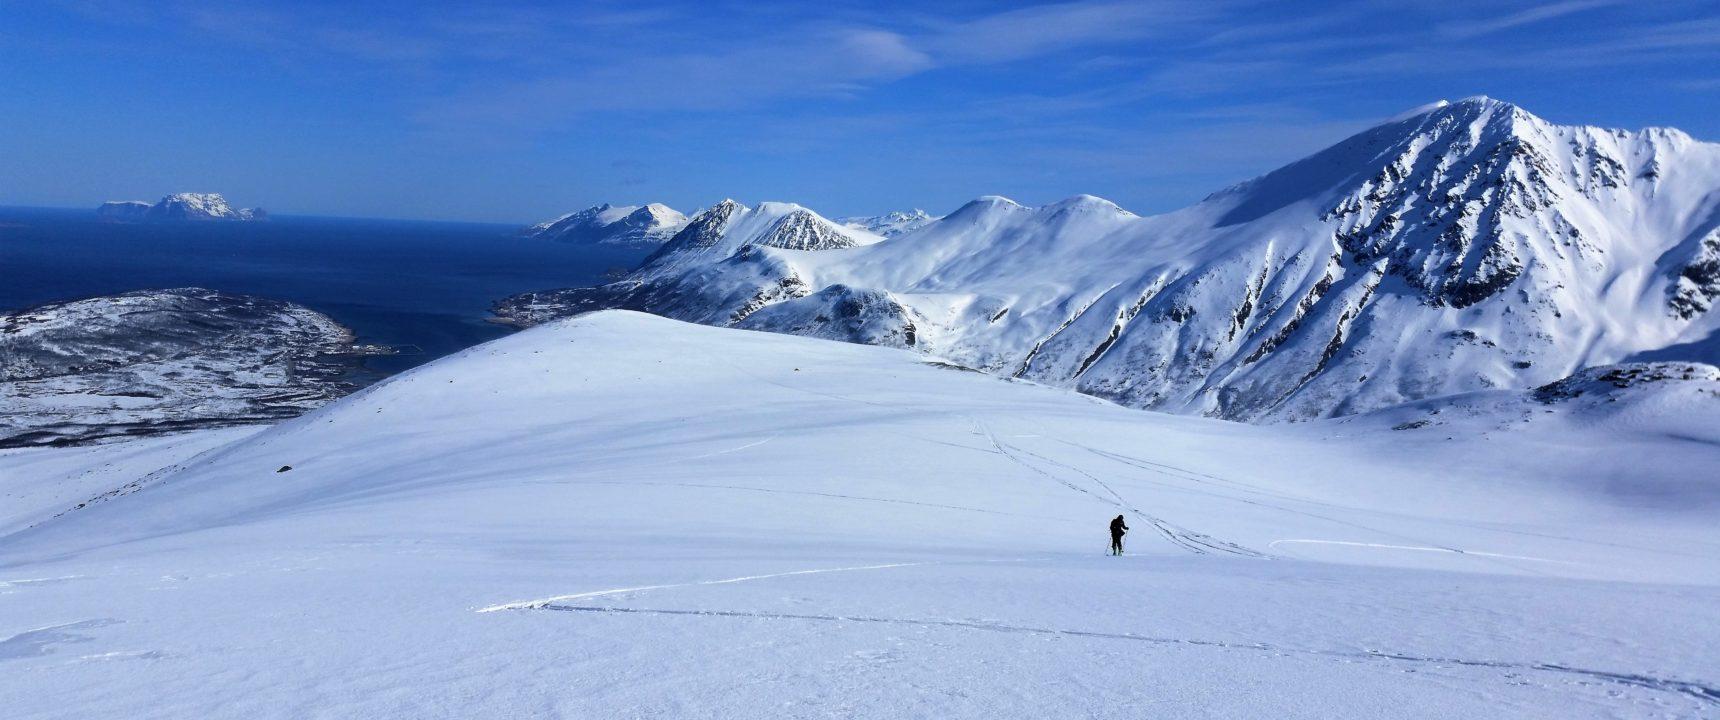 Alpy Lyngeńskie narty sikture